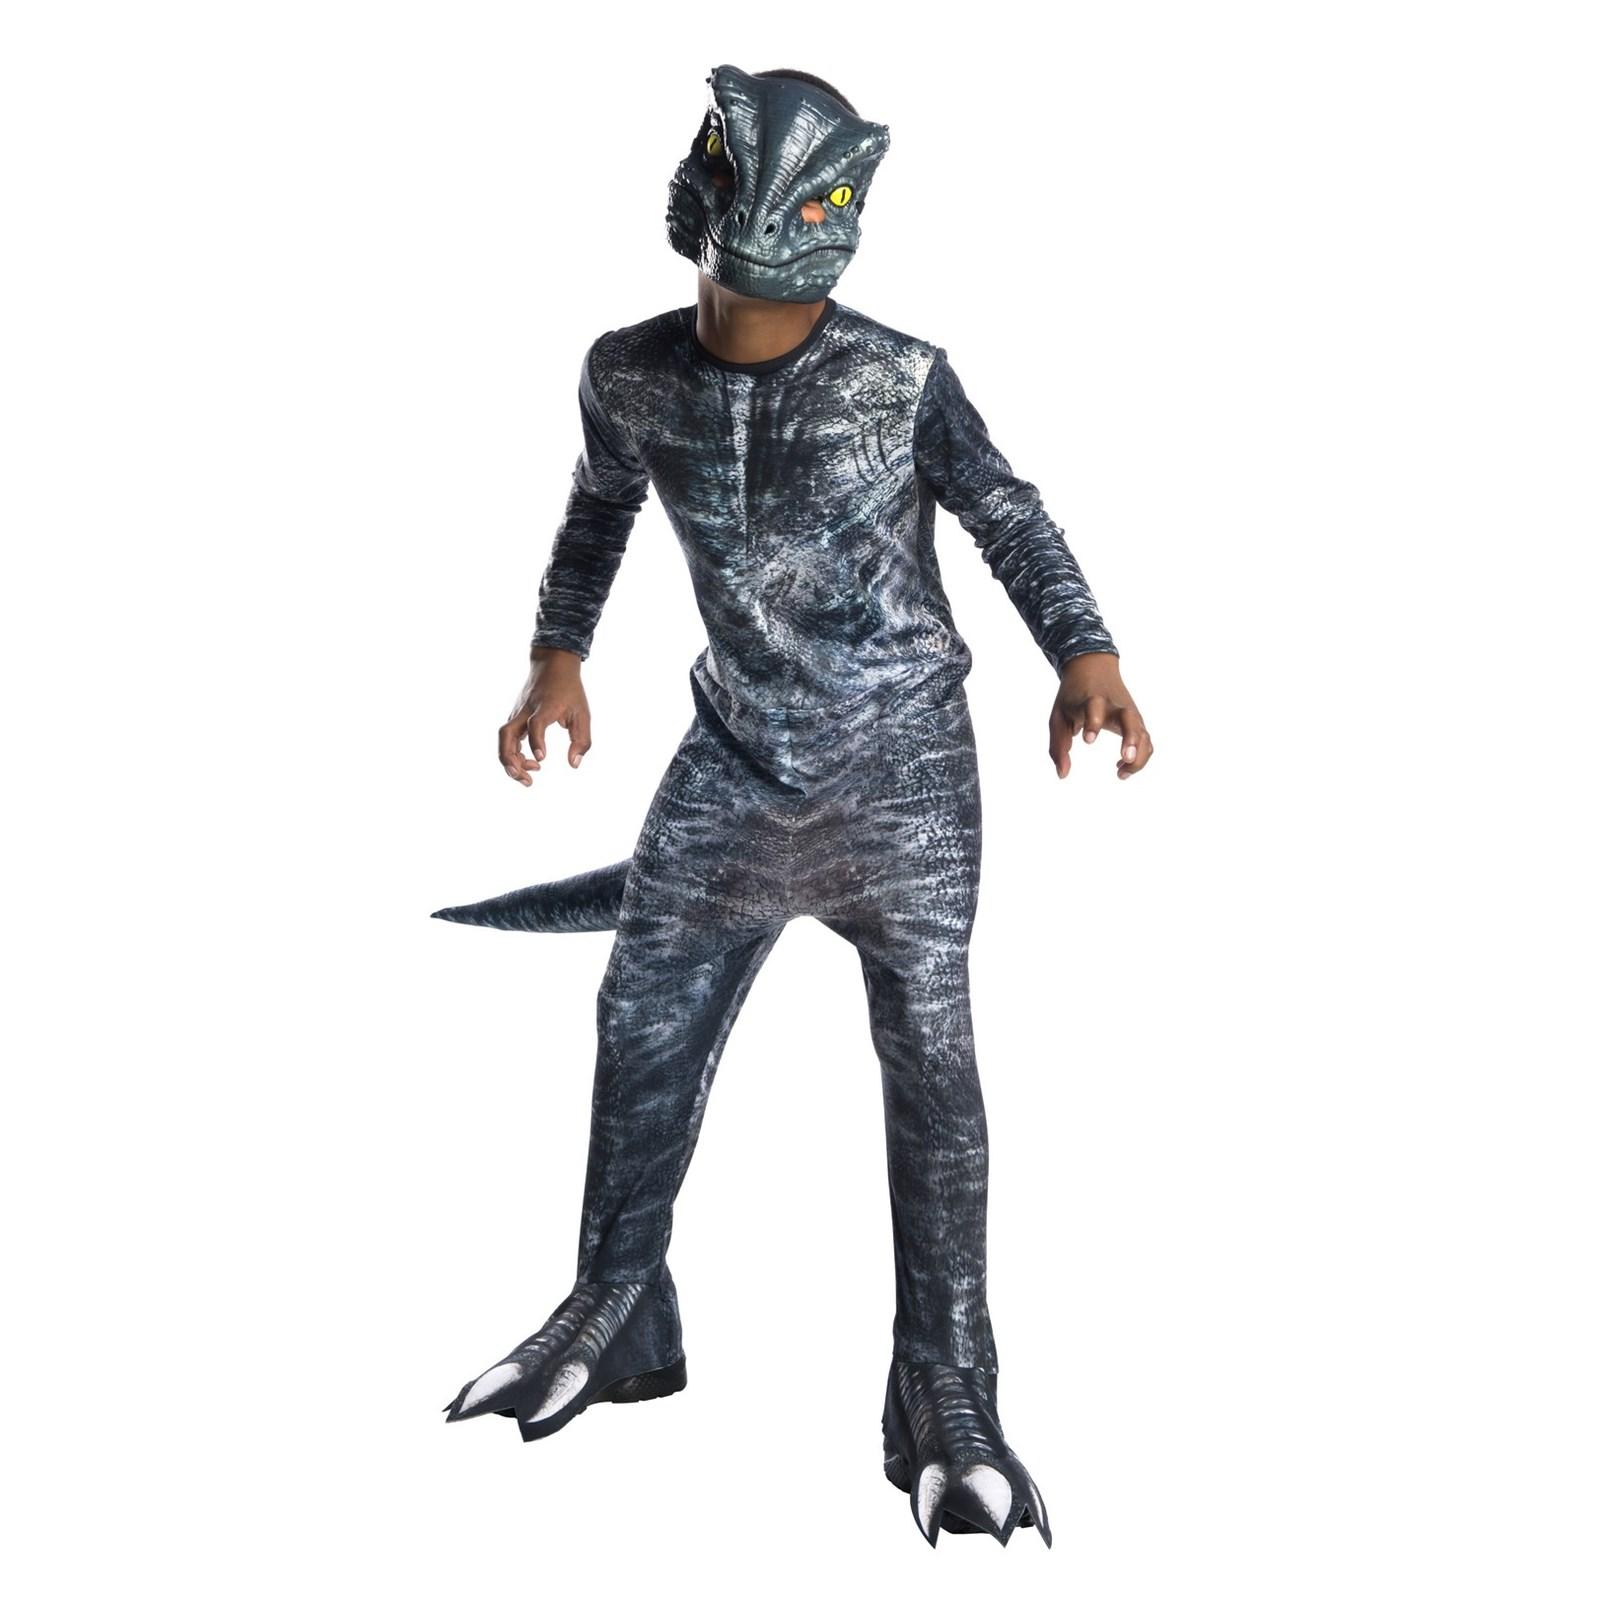 Jurassic World: Fallen Kingdom Velociraptor Child Halloween Costume